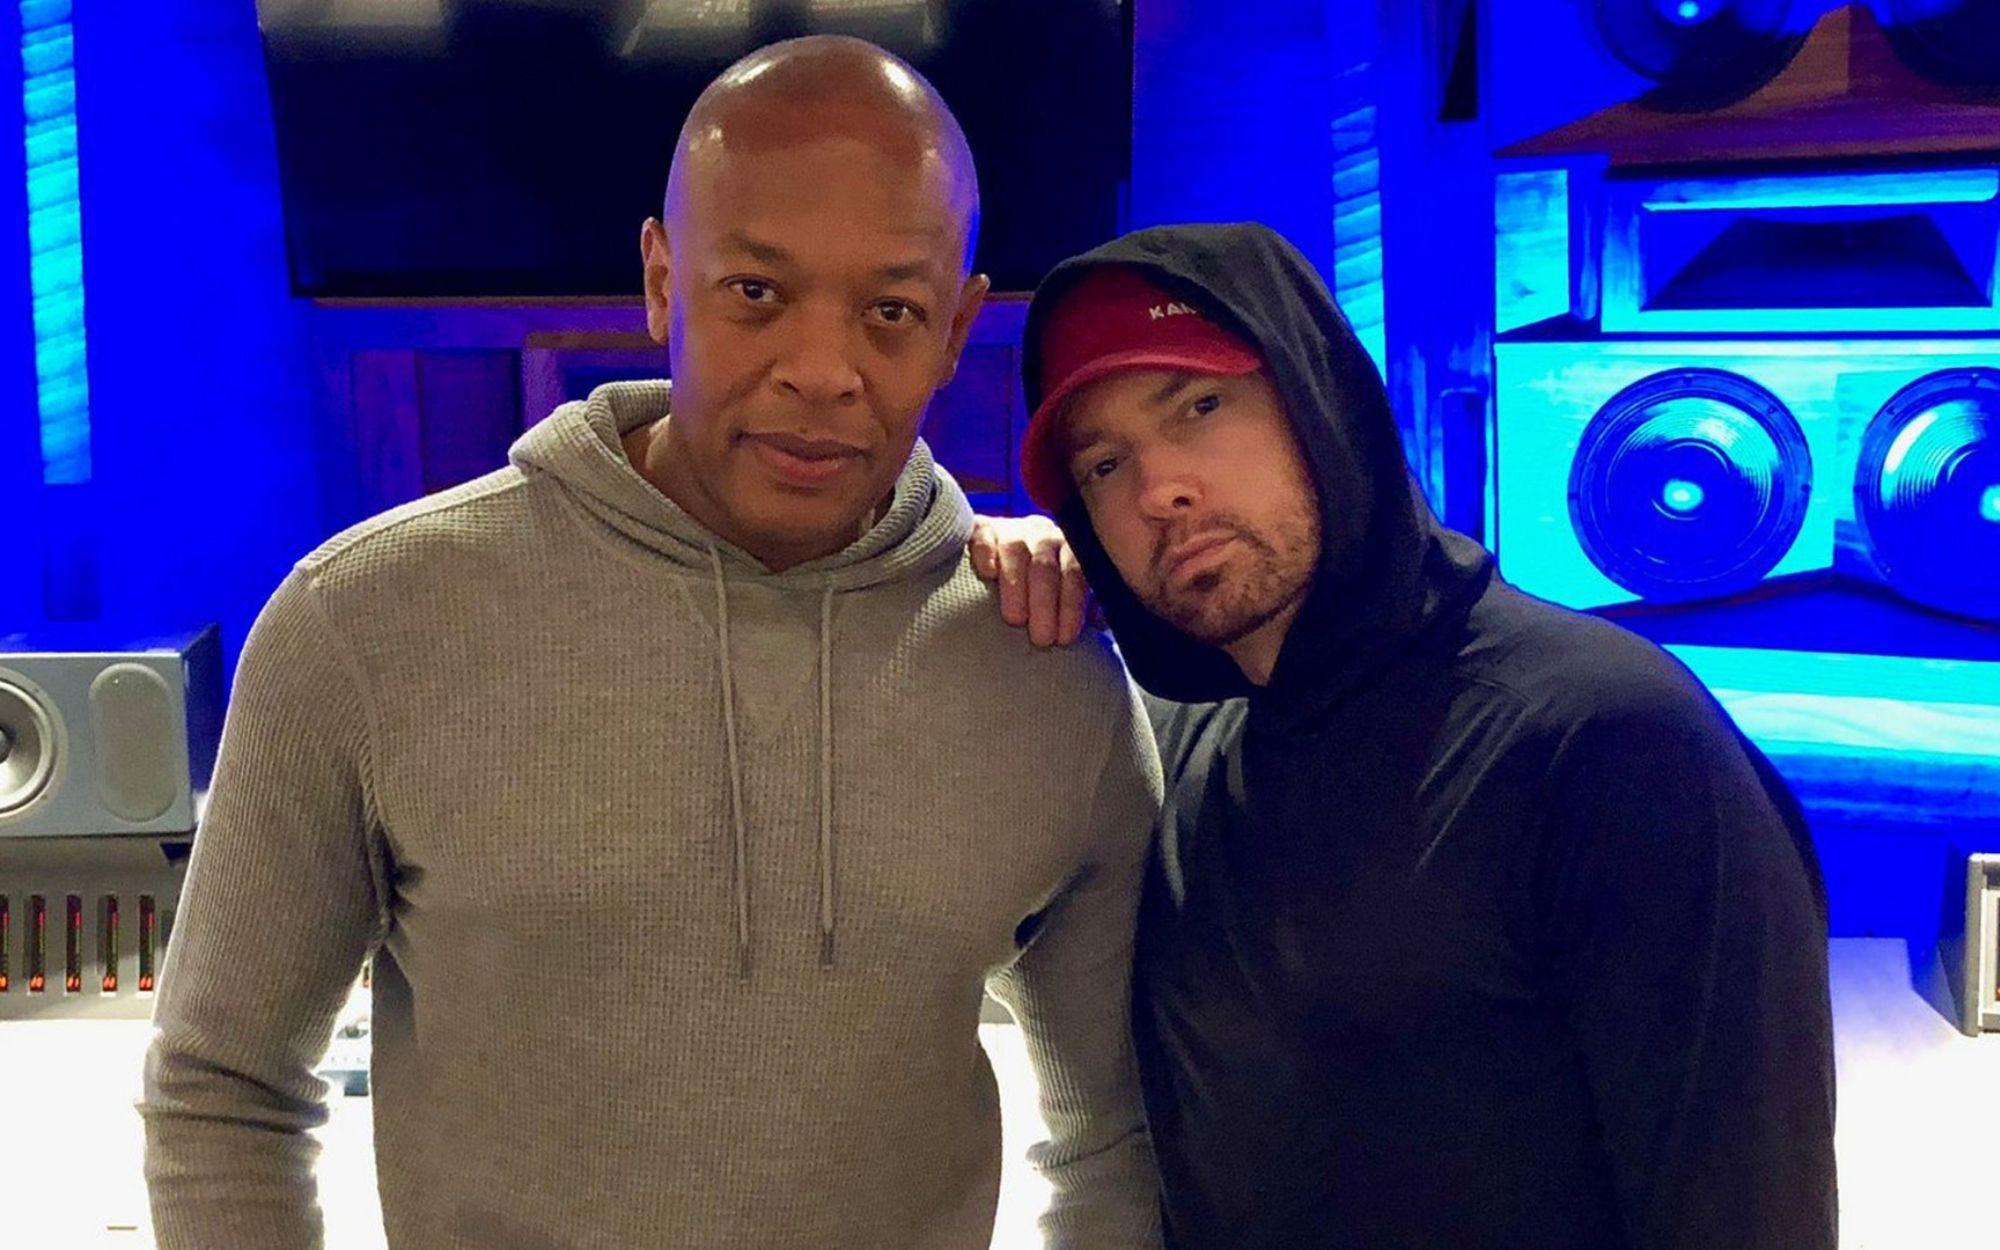 quem é dr. dre Eminem